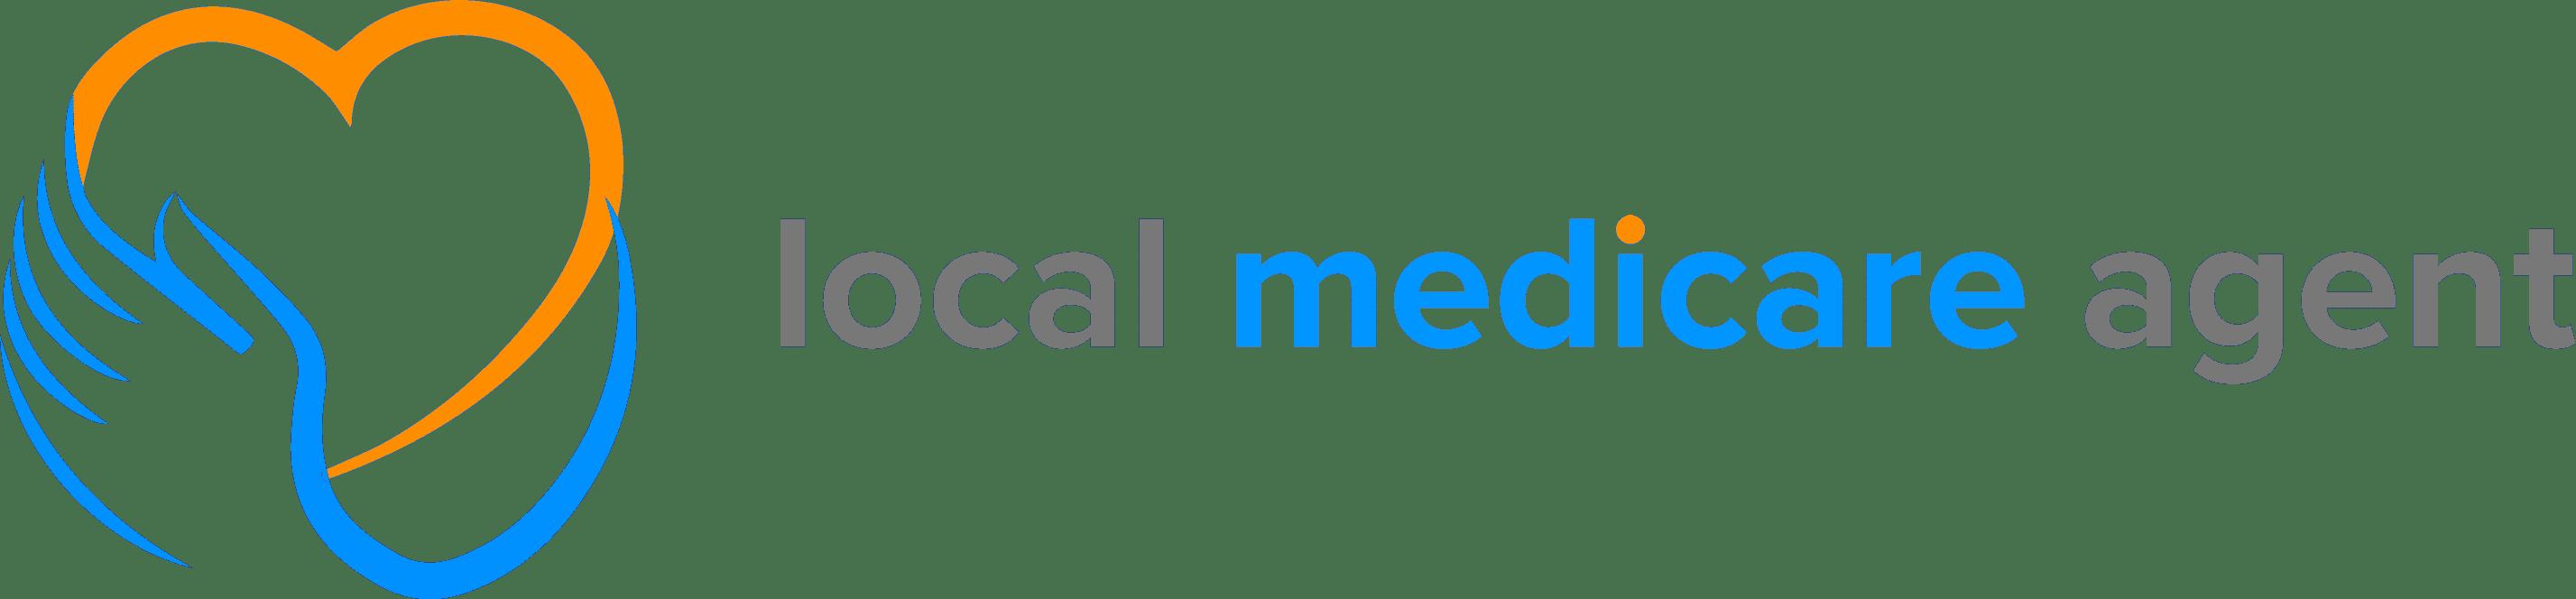 Local_medicare_agent logo   BenaVest